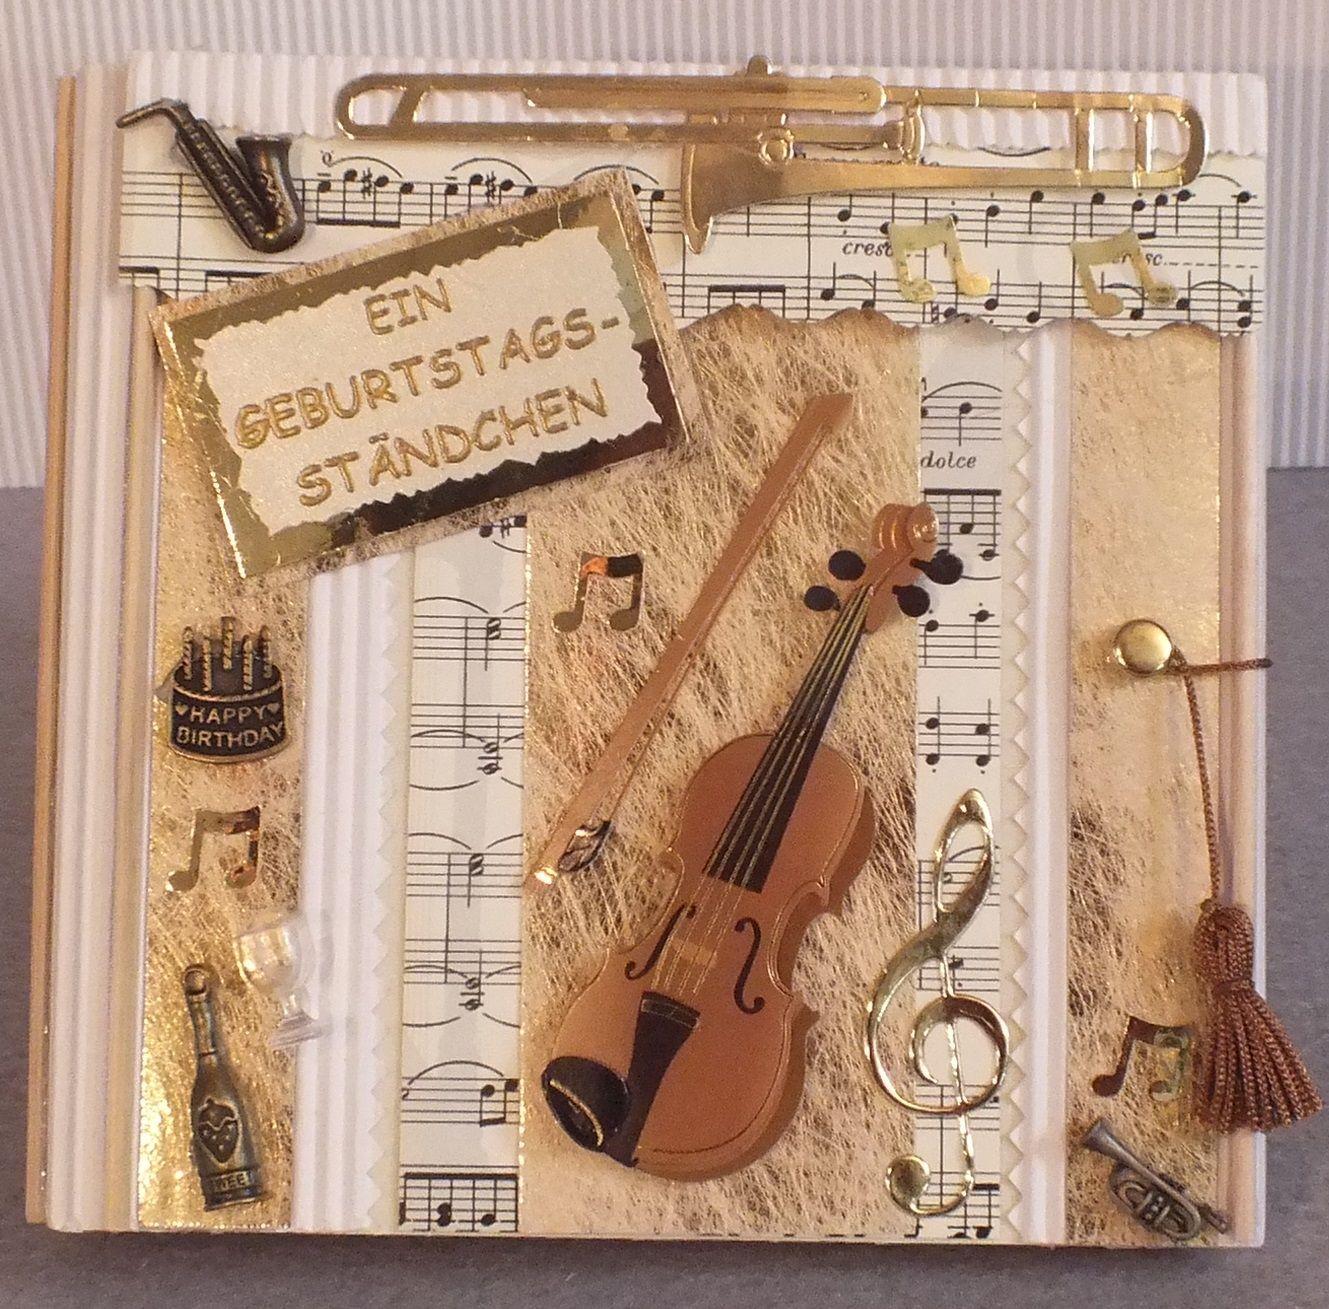 Geburtstagskarte Musiker Musikliebhaber Geburtstagskarten Cards